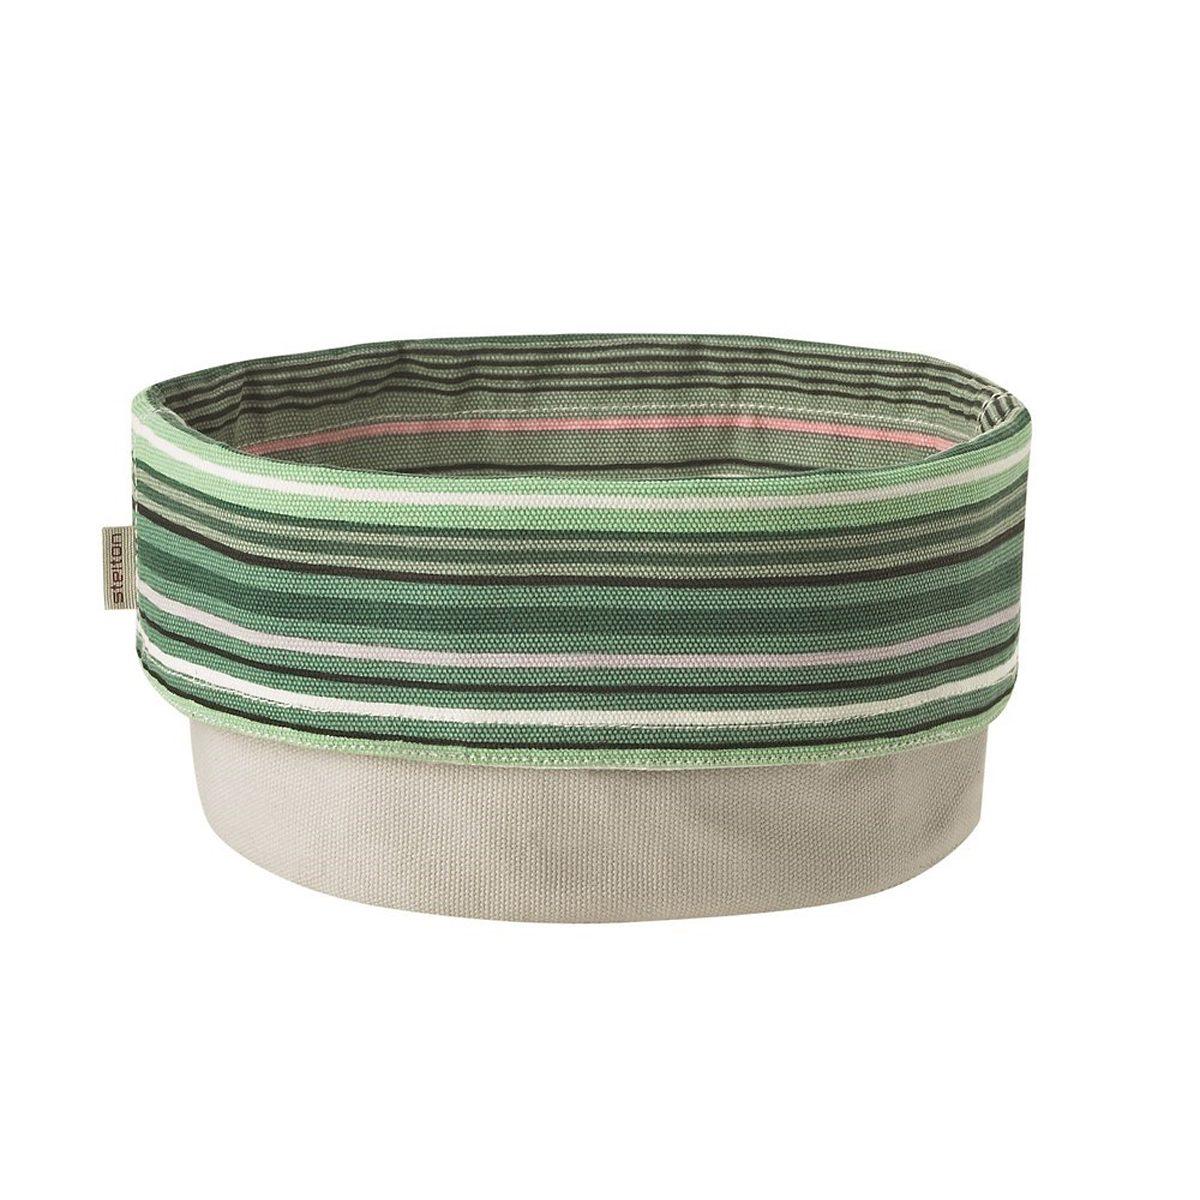 Stelton Stelton Brottasche 23 cm gestreift mint, weiss